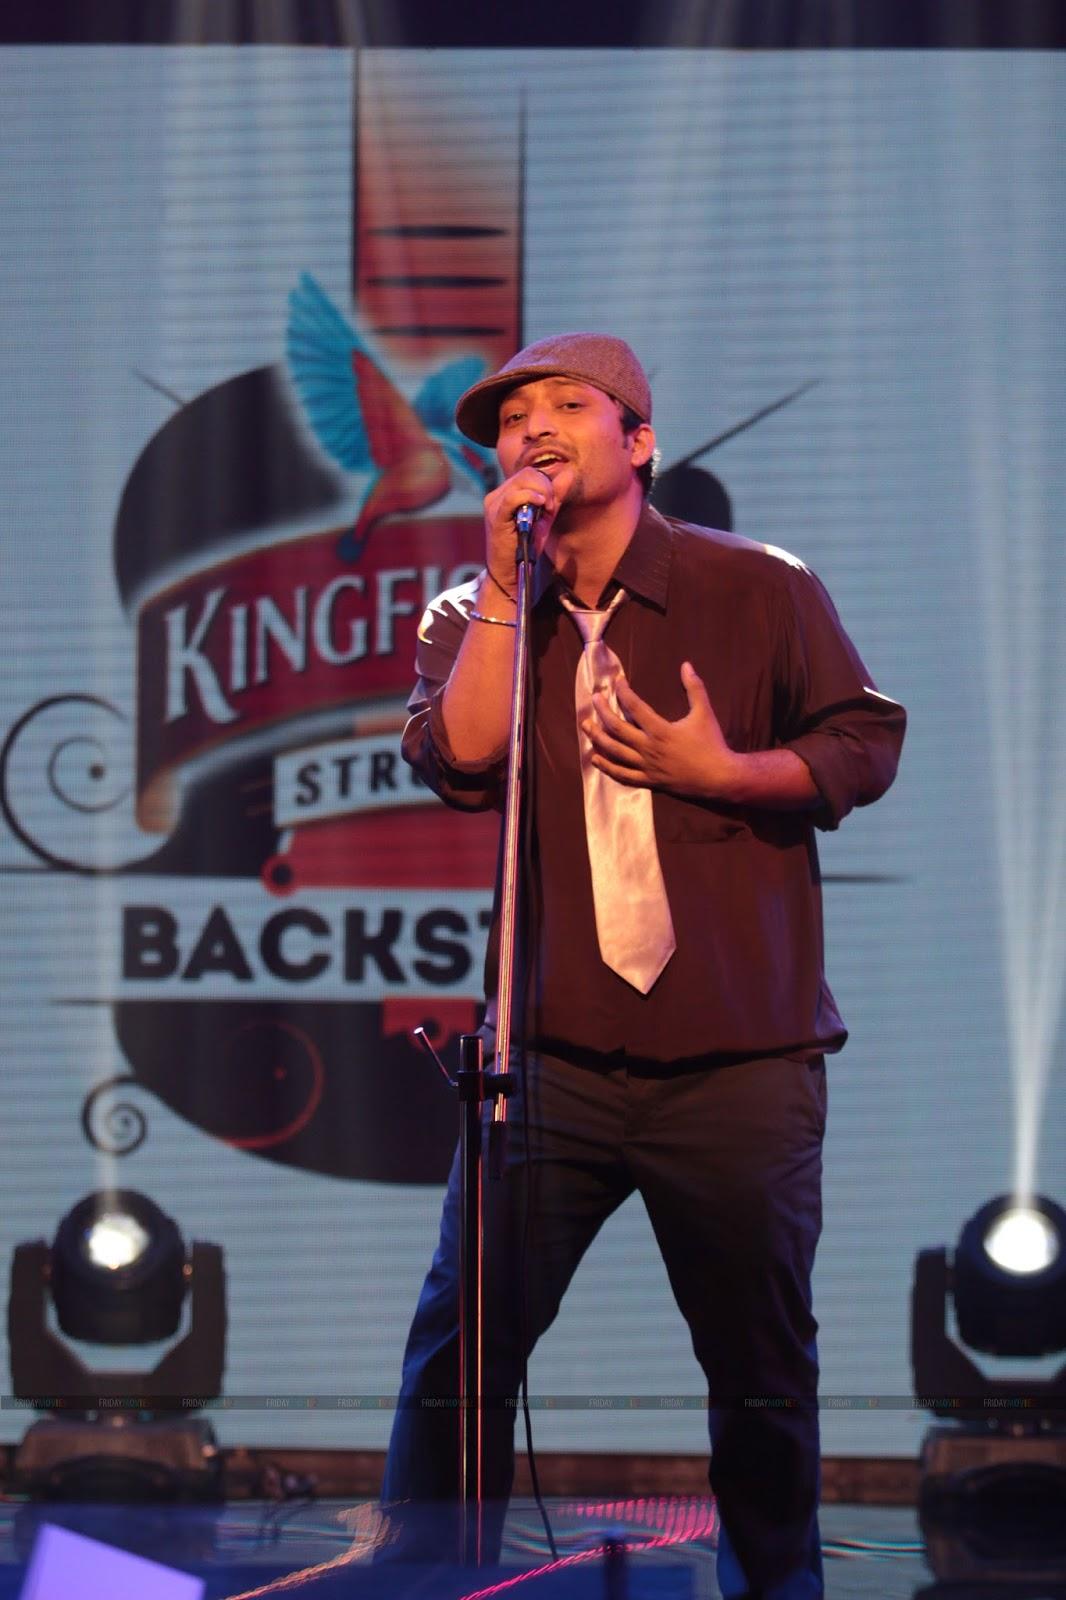 Mannu Singh at Kingfisher Strong Backstage - EF News International